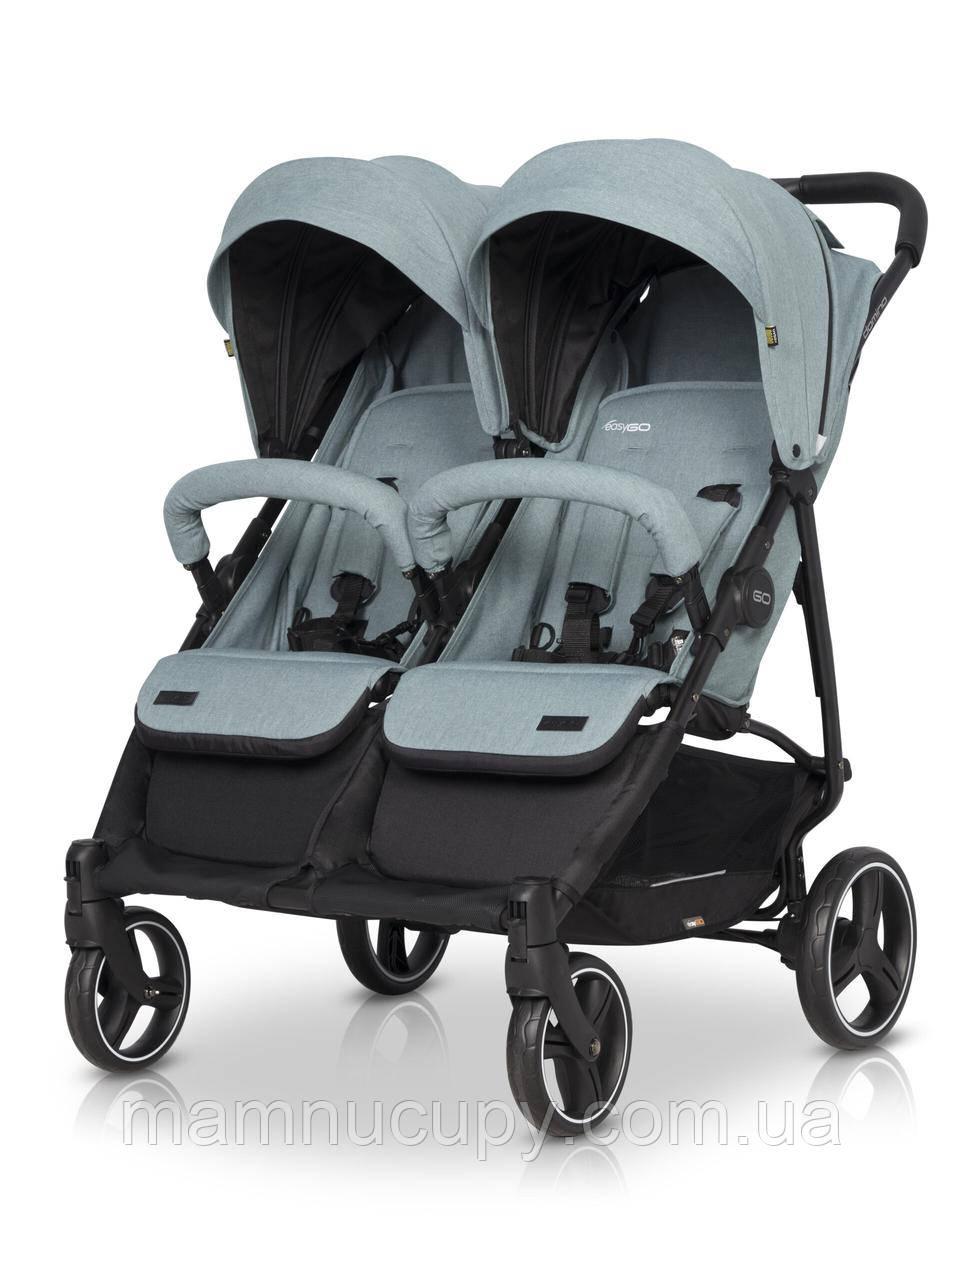 Детская прогулочная коляска для двойни EasyGo Domino 2020 Mineral